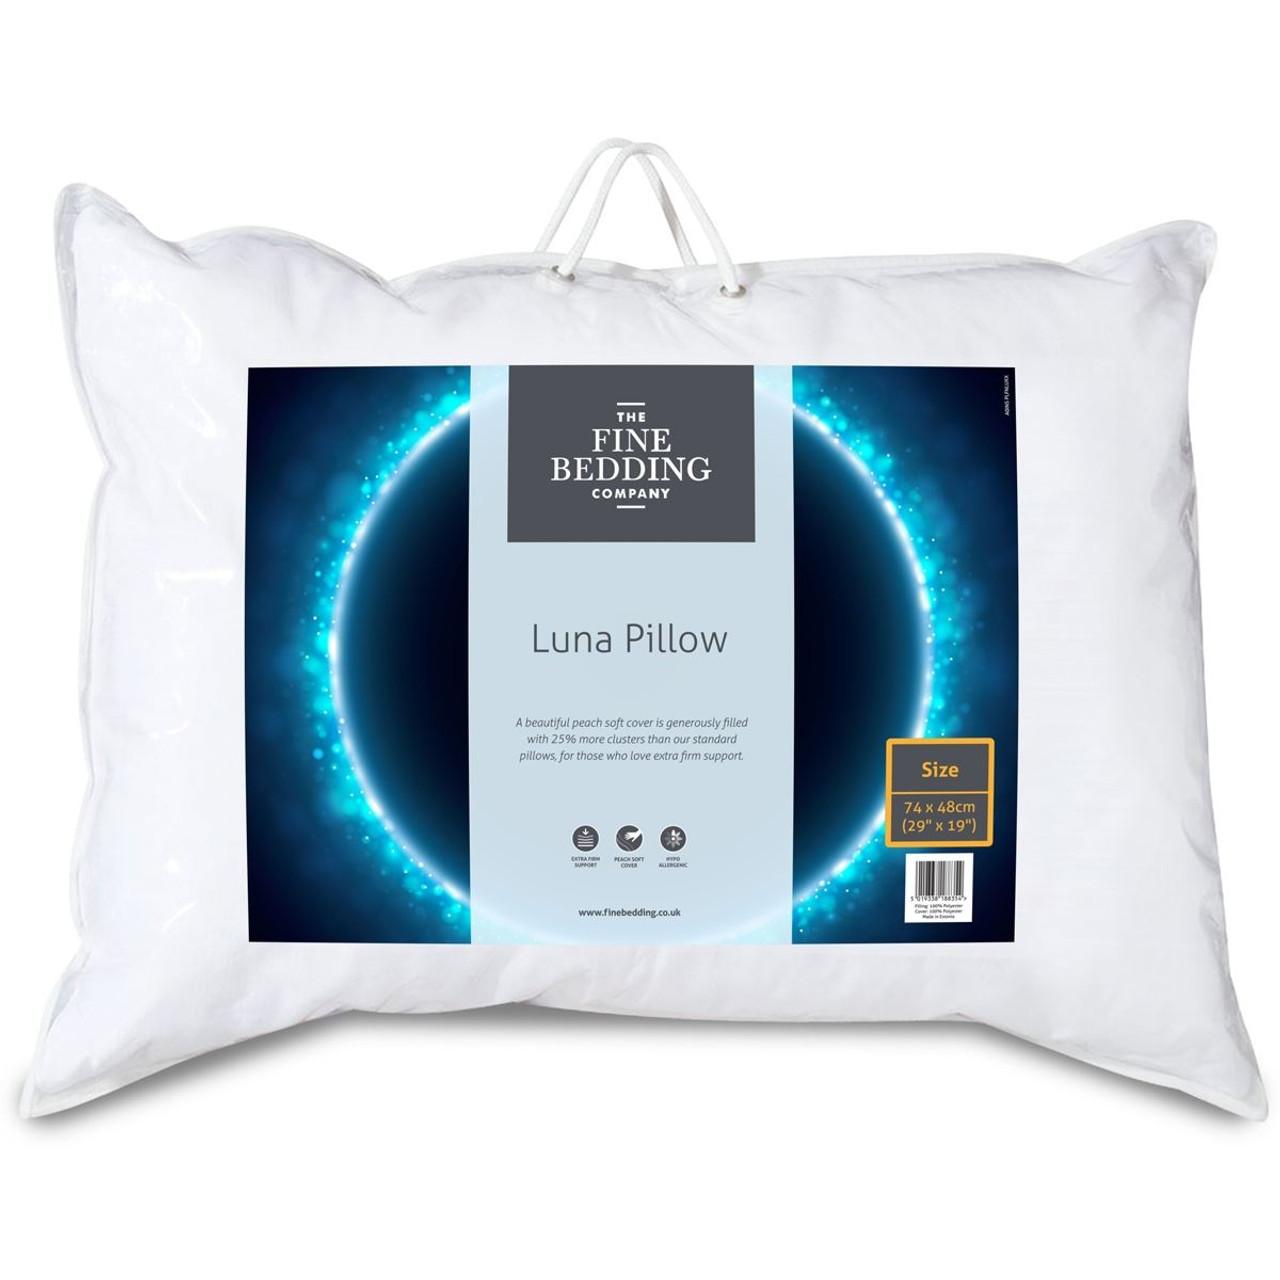 The Fine Bedding Company Luna Pillow